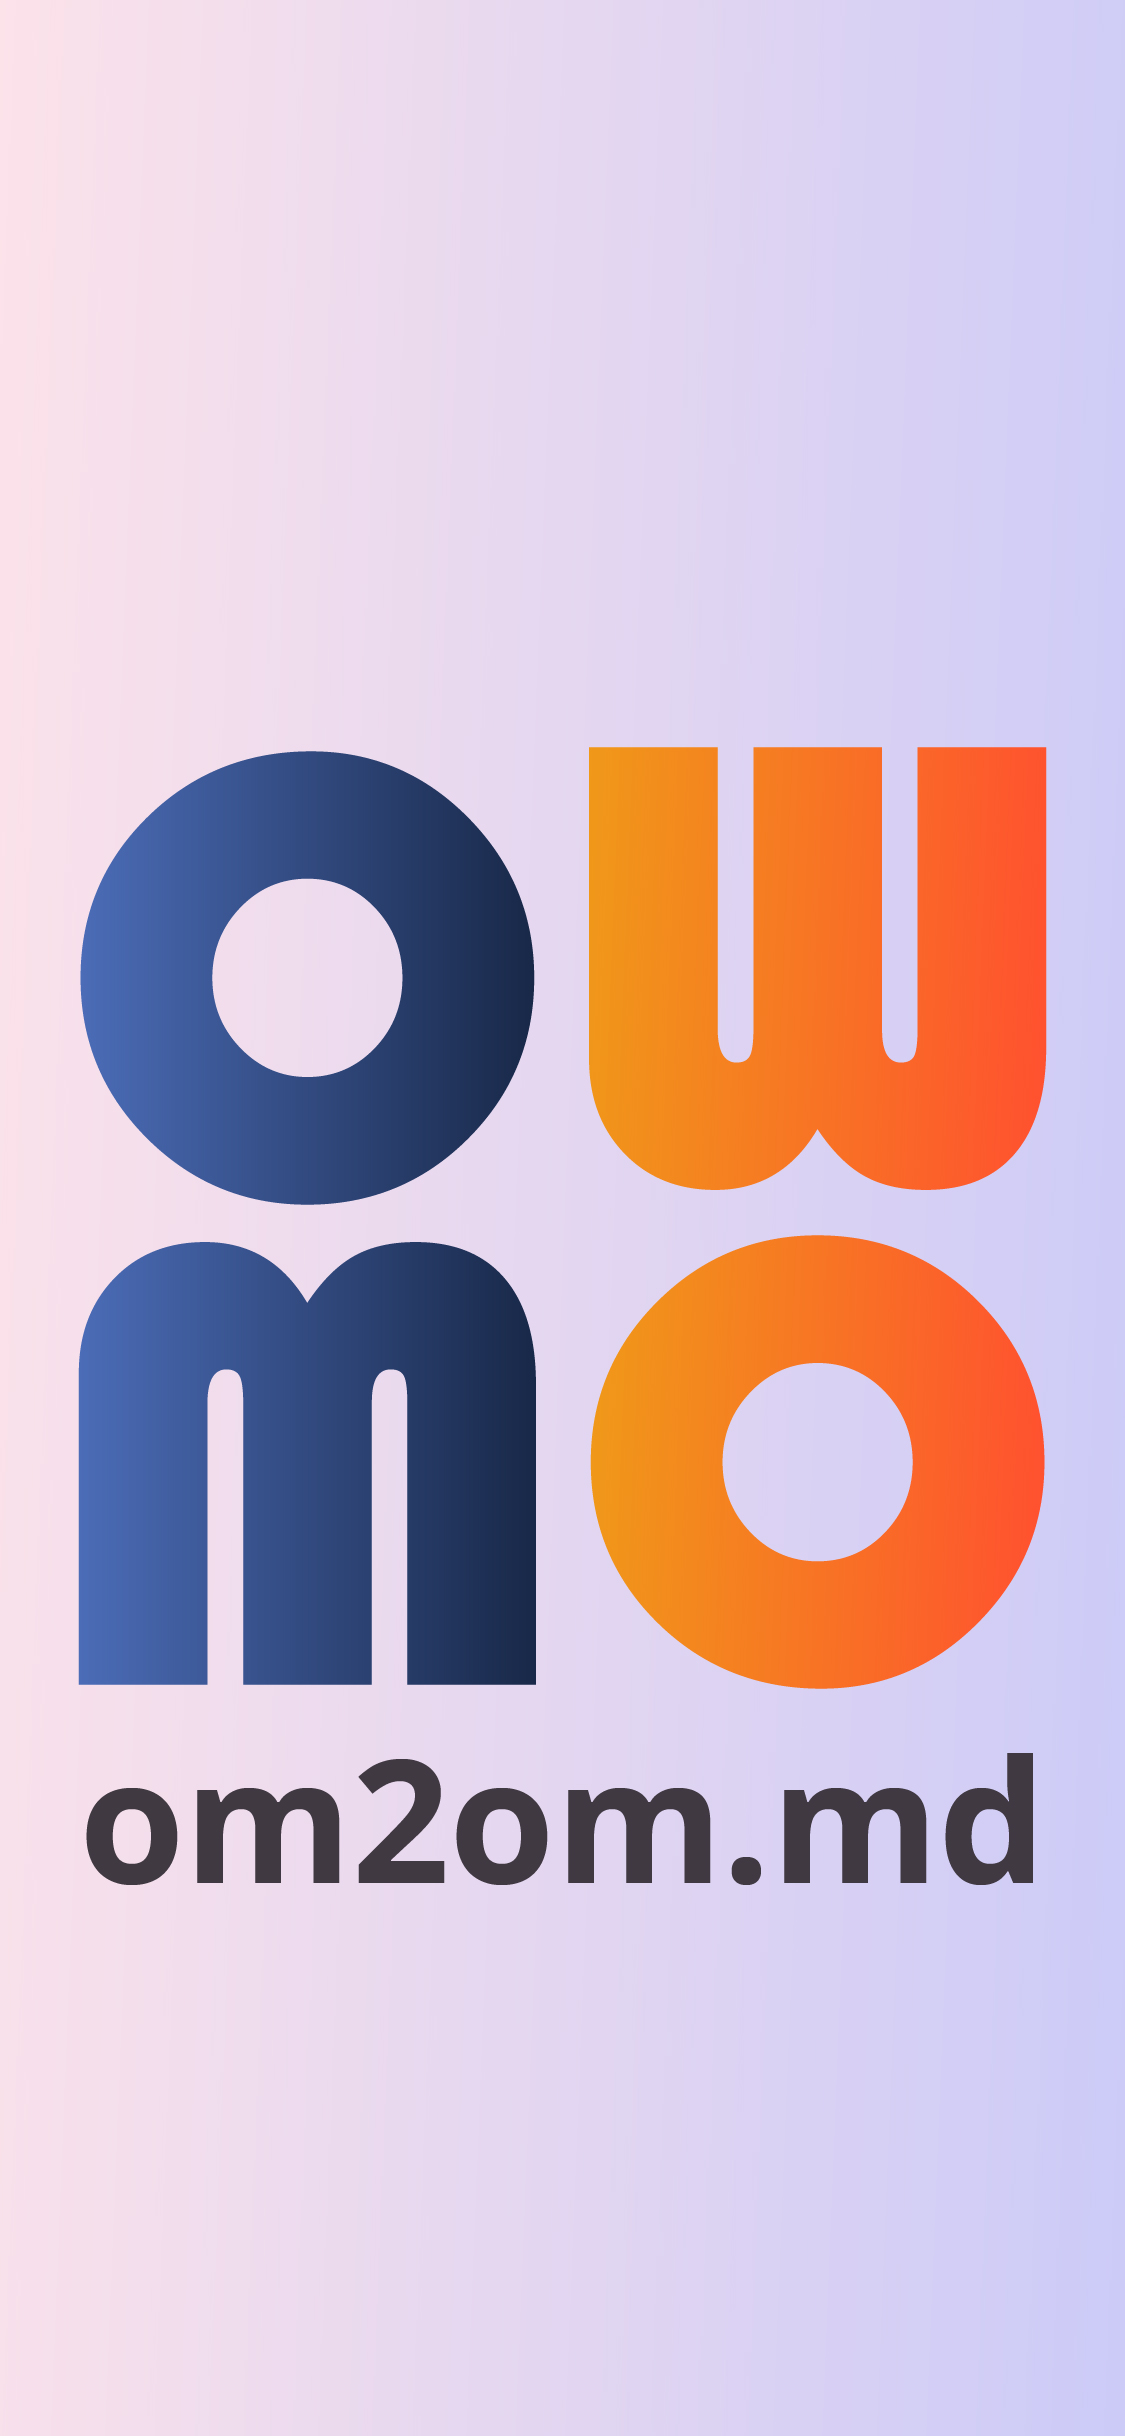 Разработка логотипа для краудфандинговой платформы om2om.md фото f_3945f5e9adaa1756.jpg